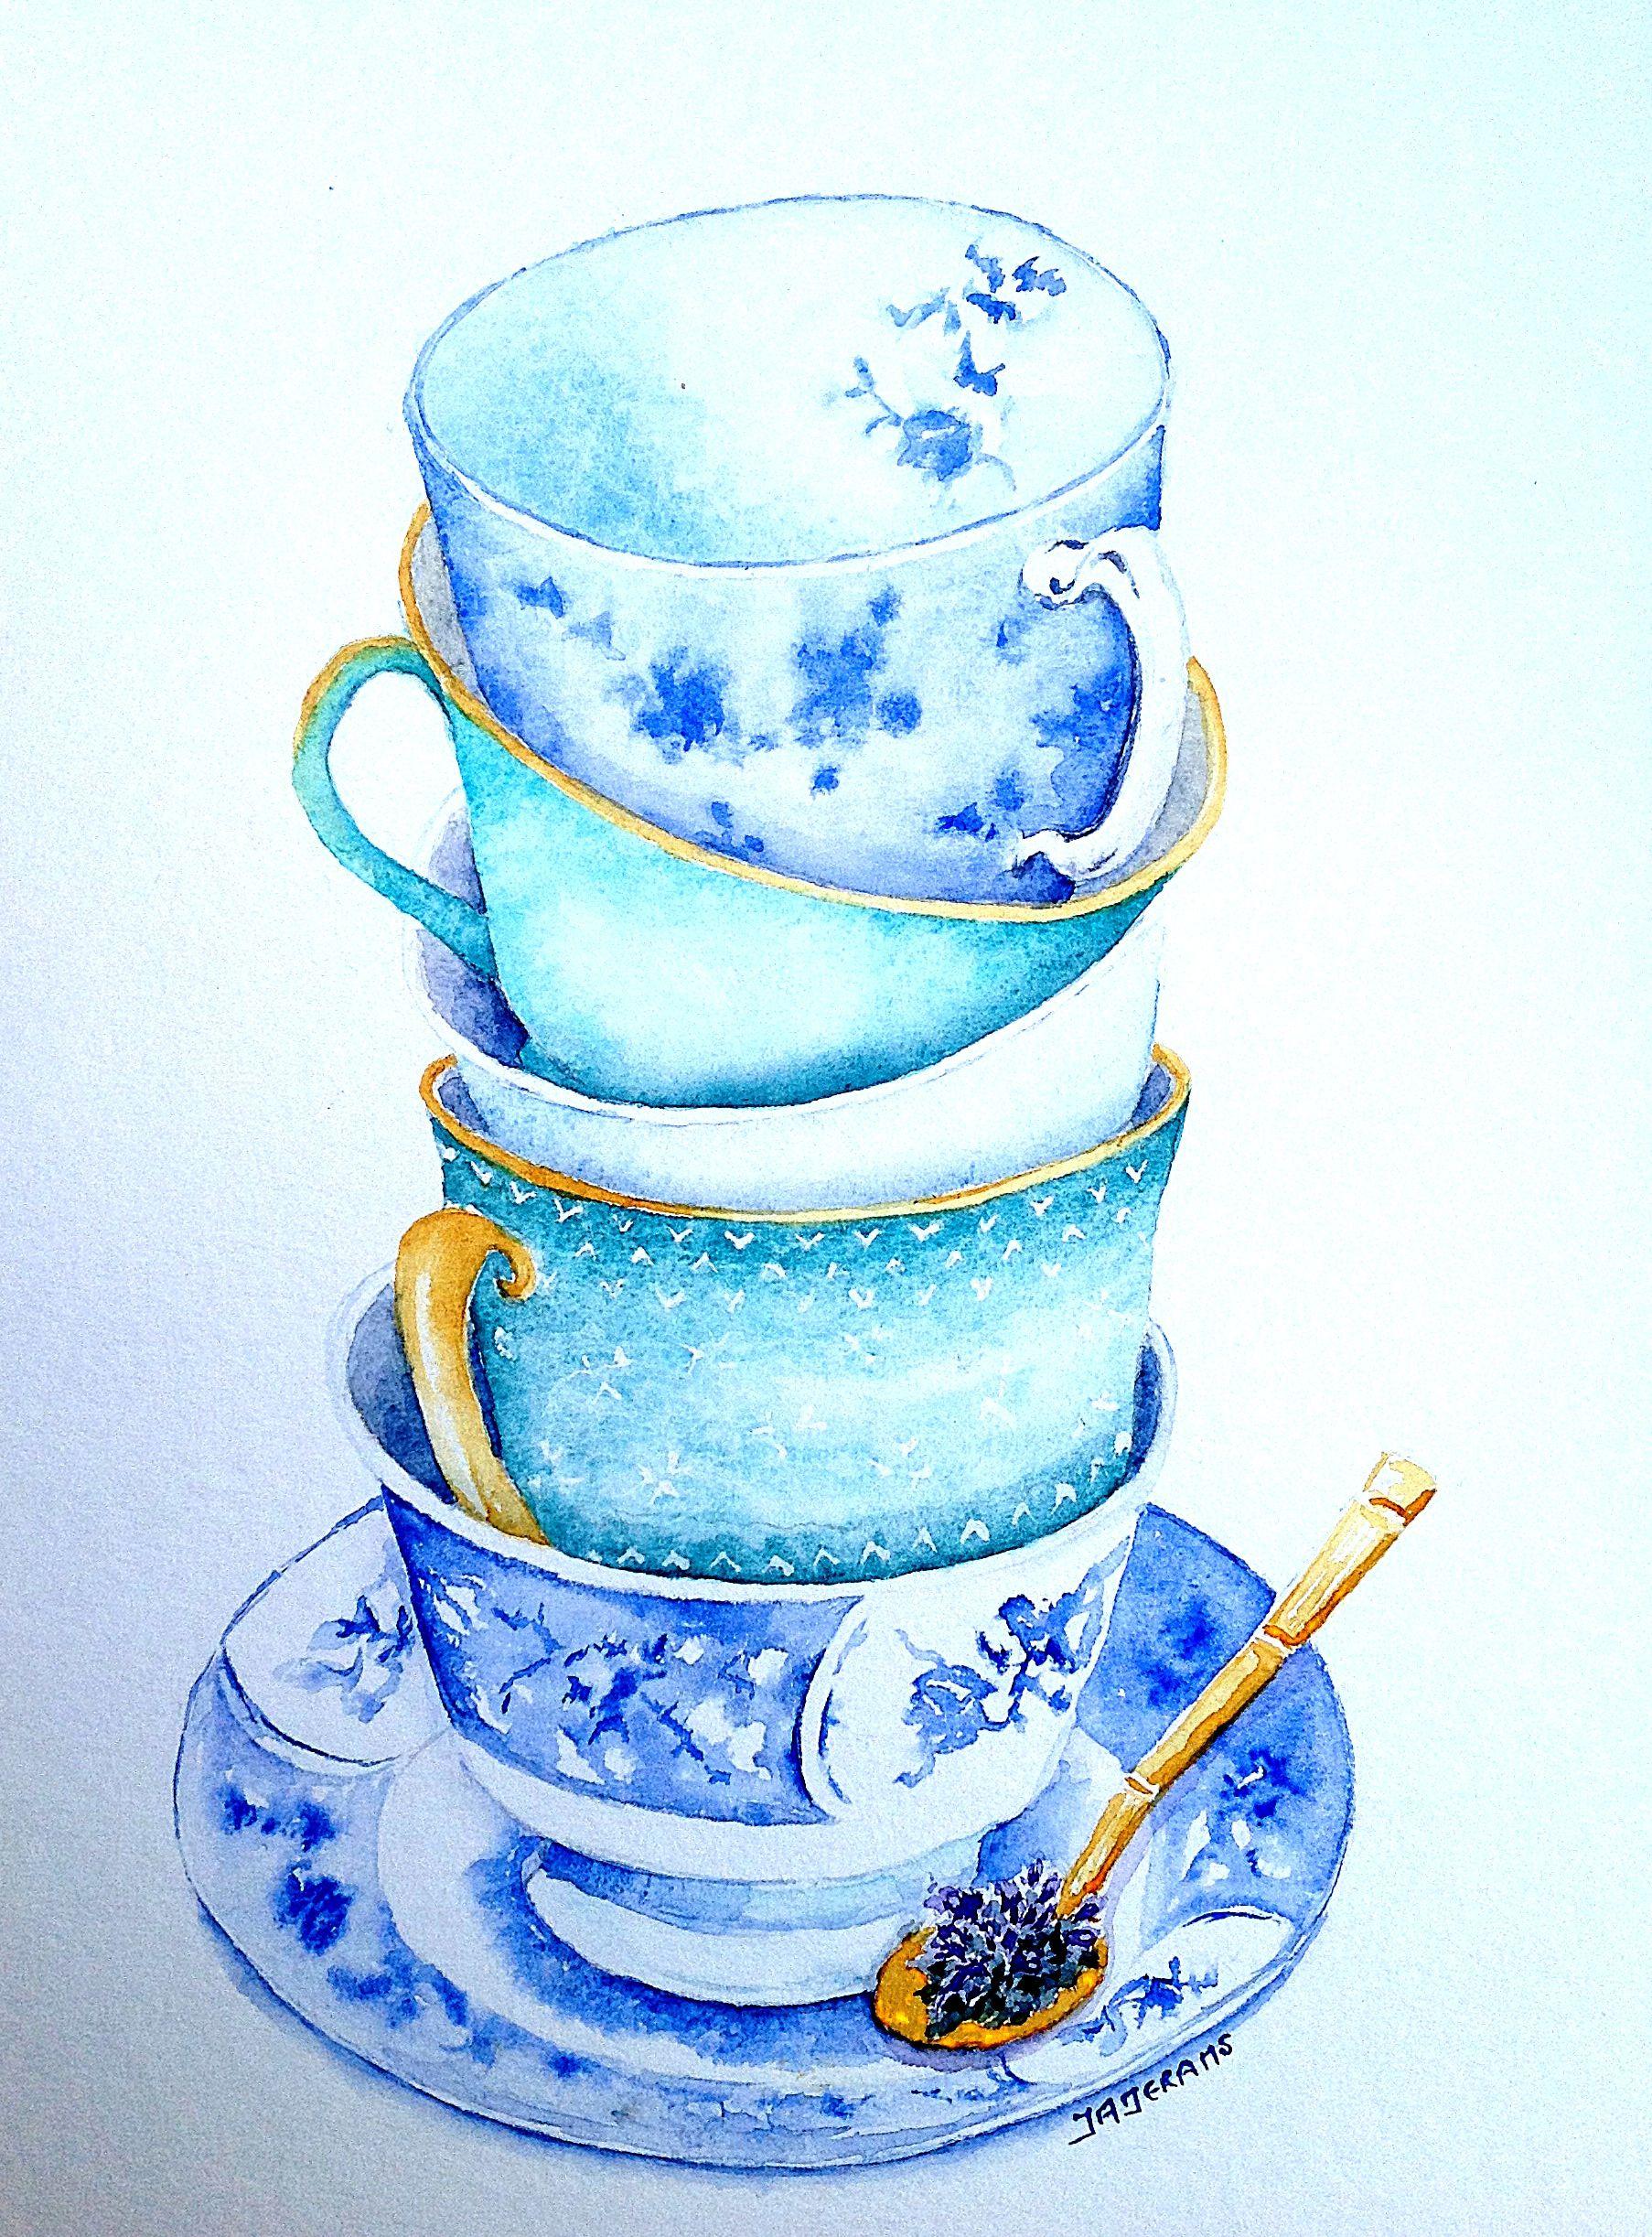 Teacups by Judith Jerams